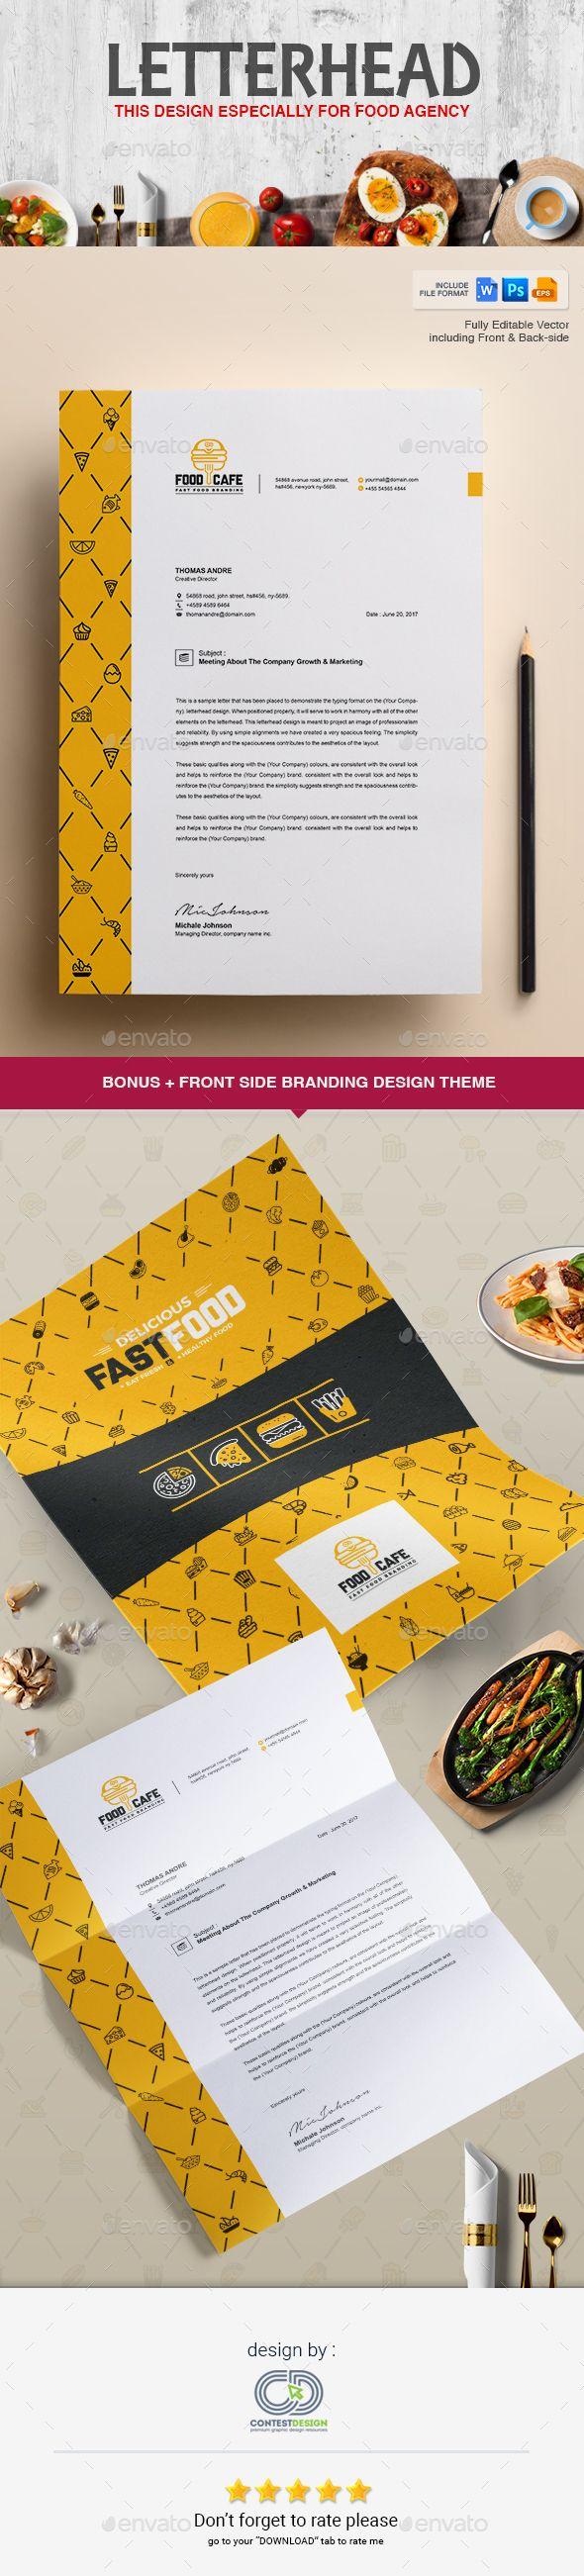 Letterhead Design Template for Fast Food / Restaurants / Cafe